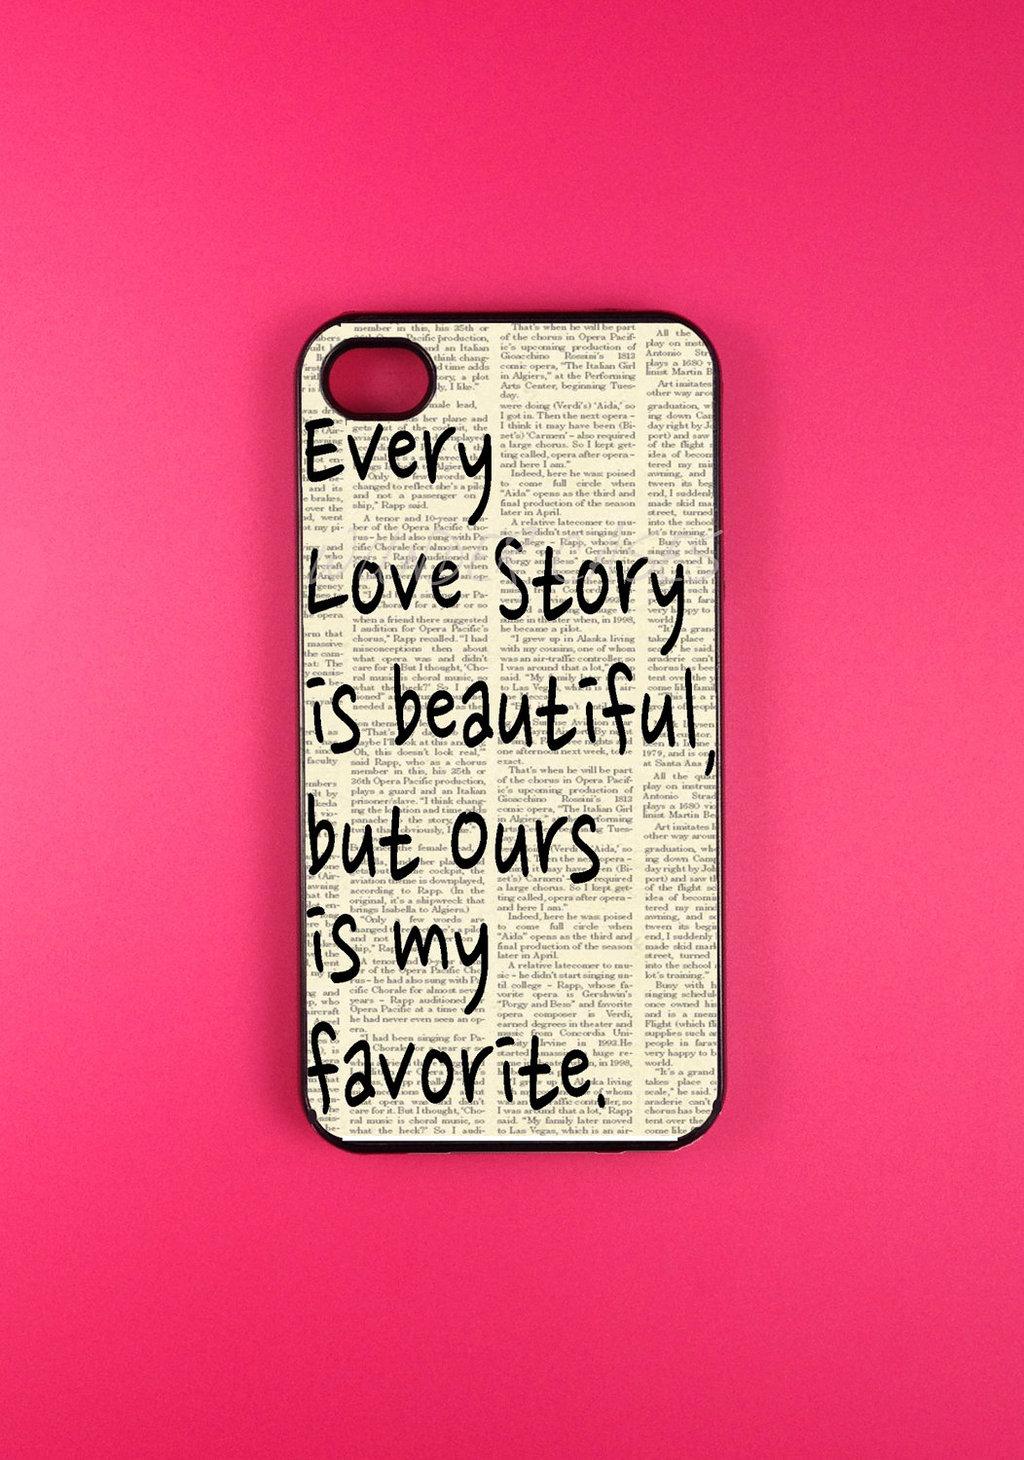 Favorite-iphone-cases-for-brides-modern-tech-weddings-love-story.full